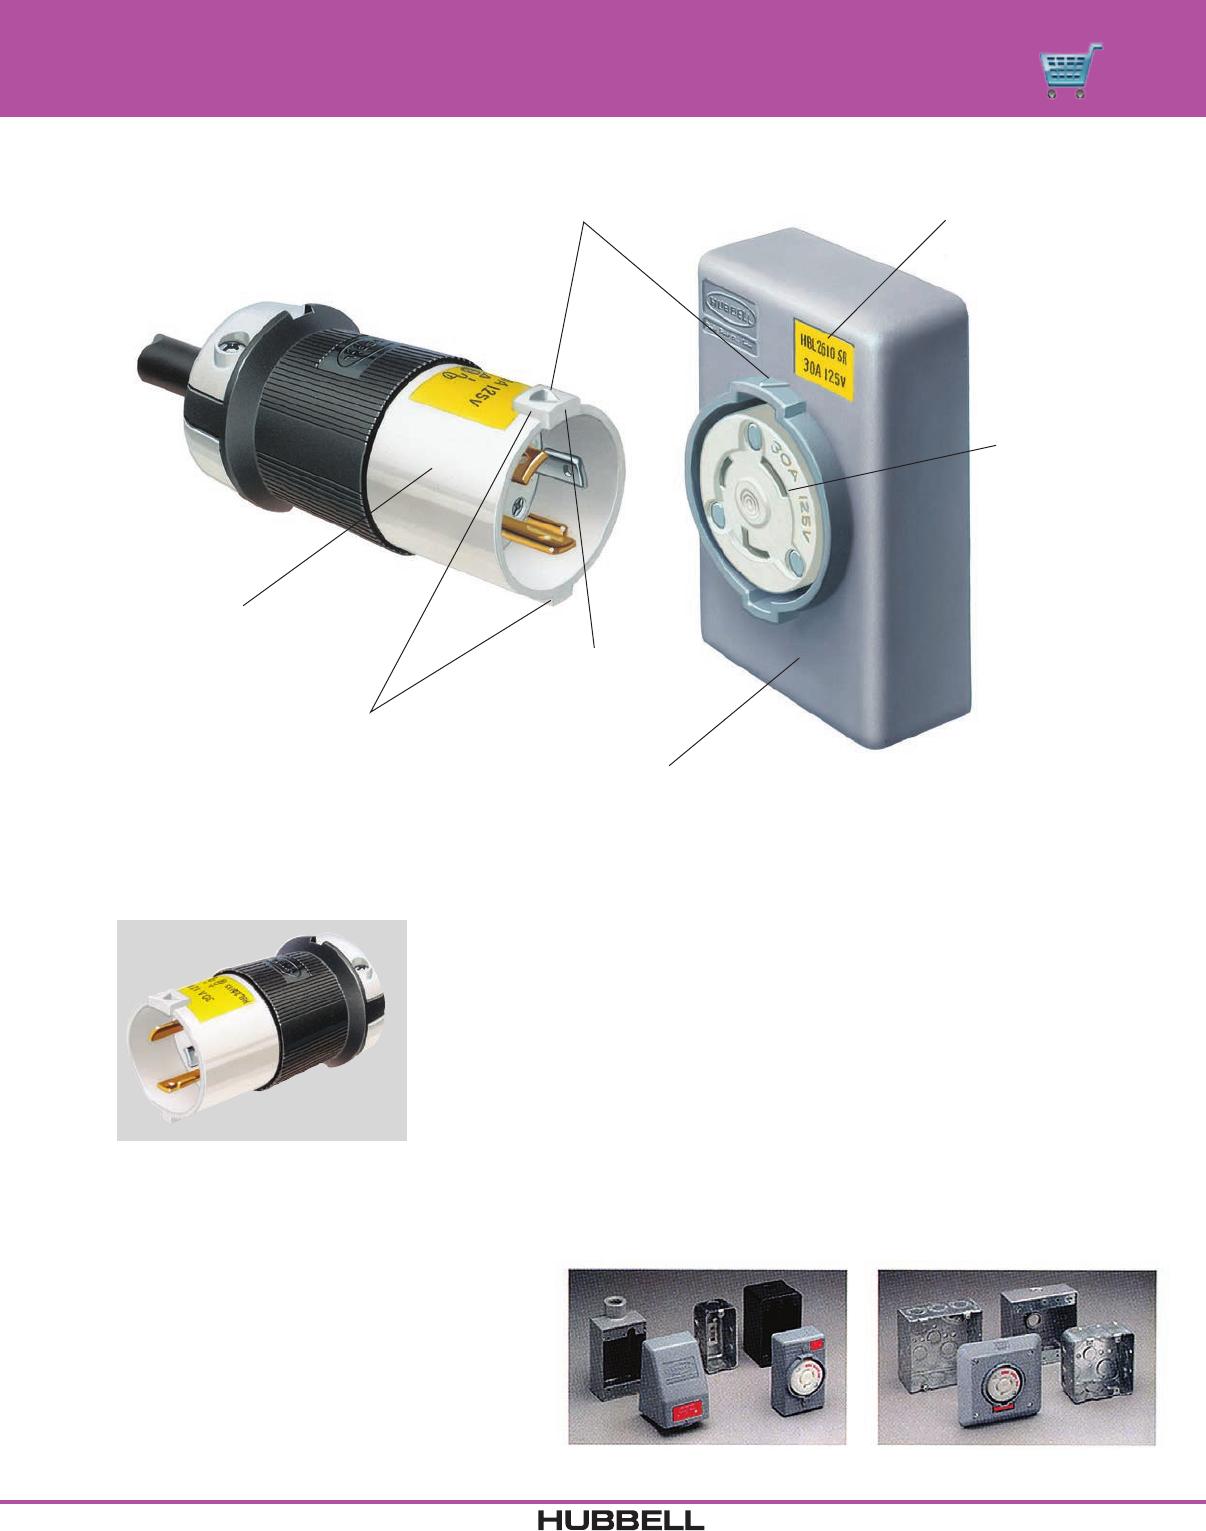 Hubbell HBL7486-G Mini Twistlock Flanged Inlet 10 Amp 250V 15 Amp 125V